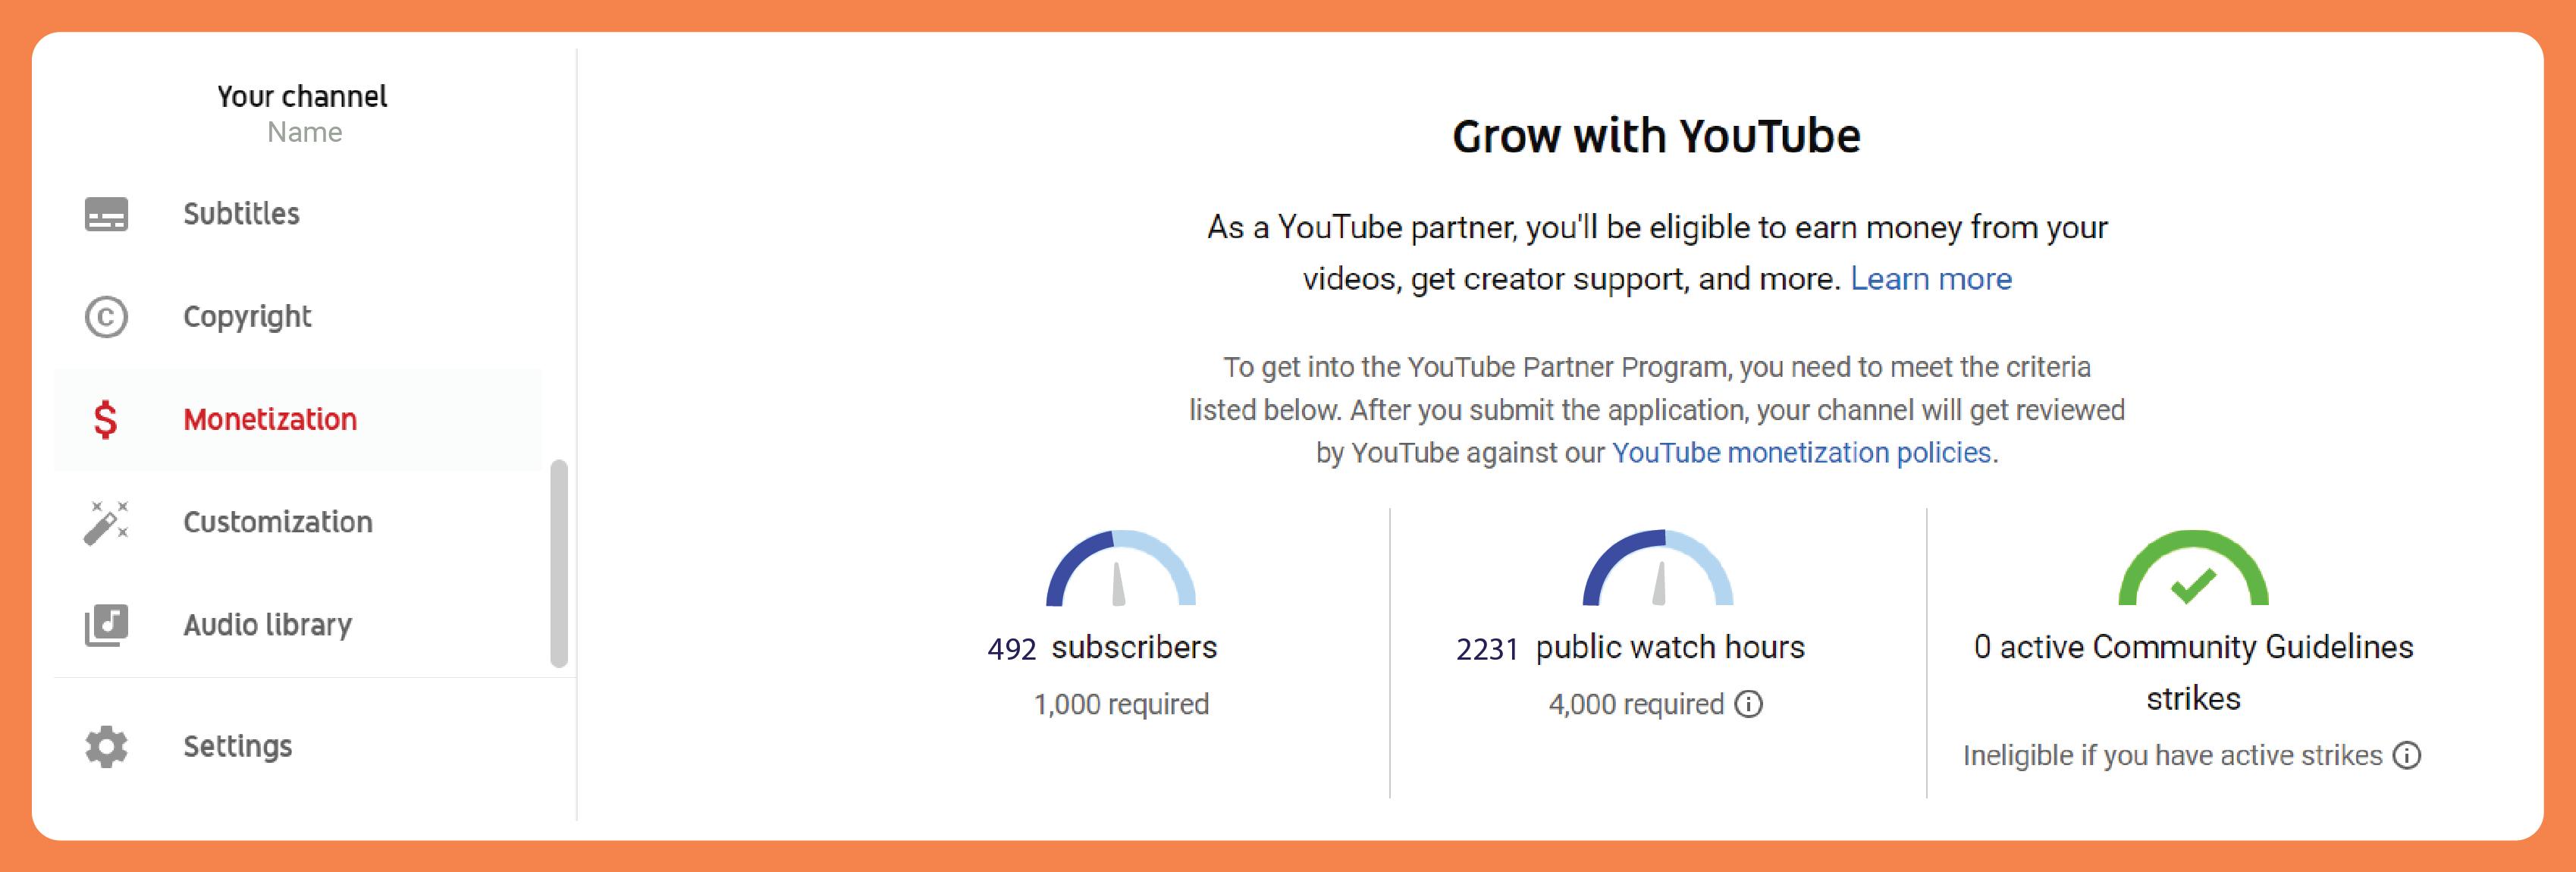 YouTube Partner Program channel homepage